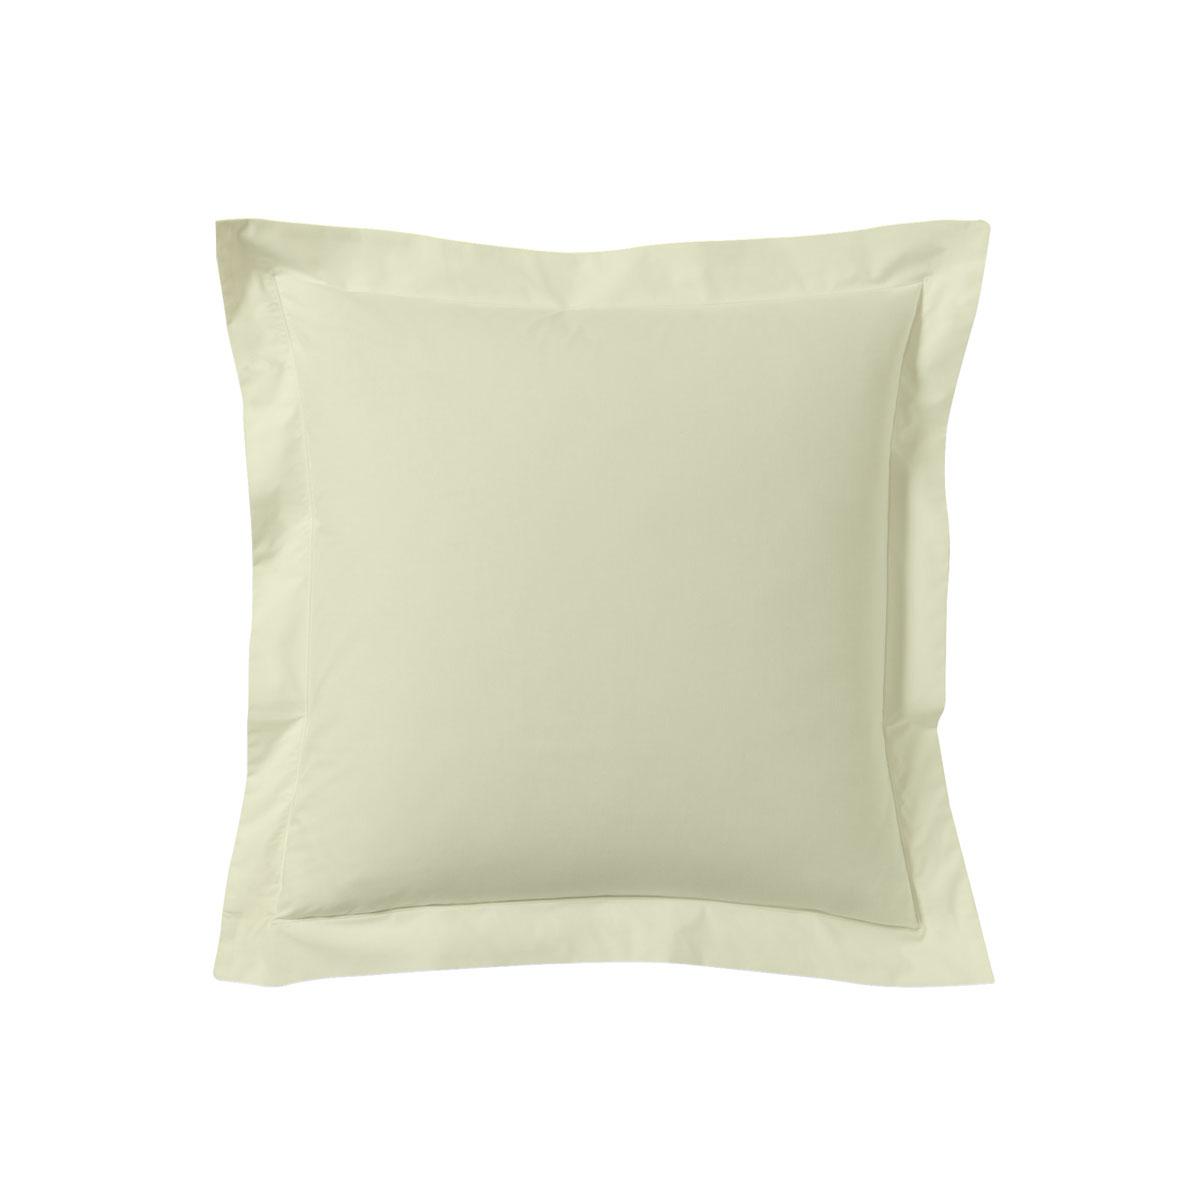 Taie d'oreiller unie en coton lin 63x63